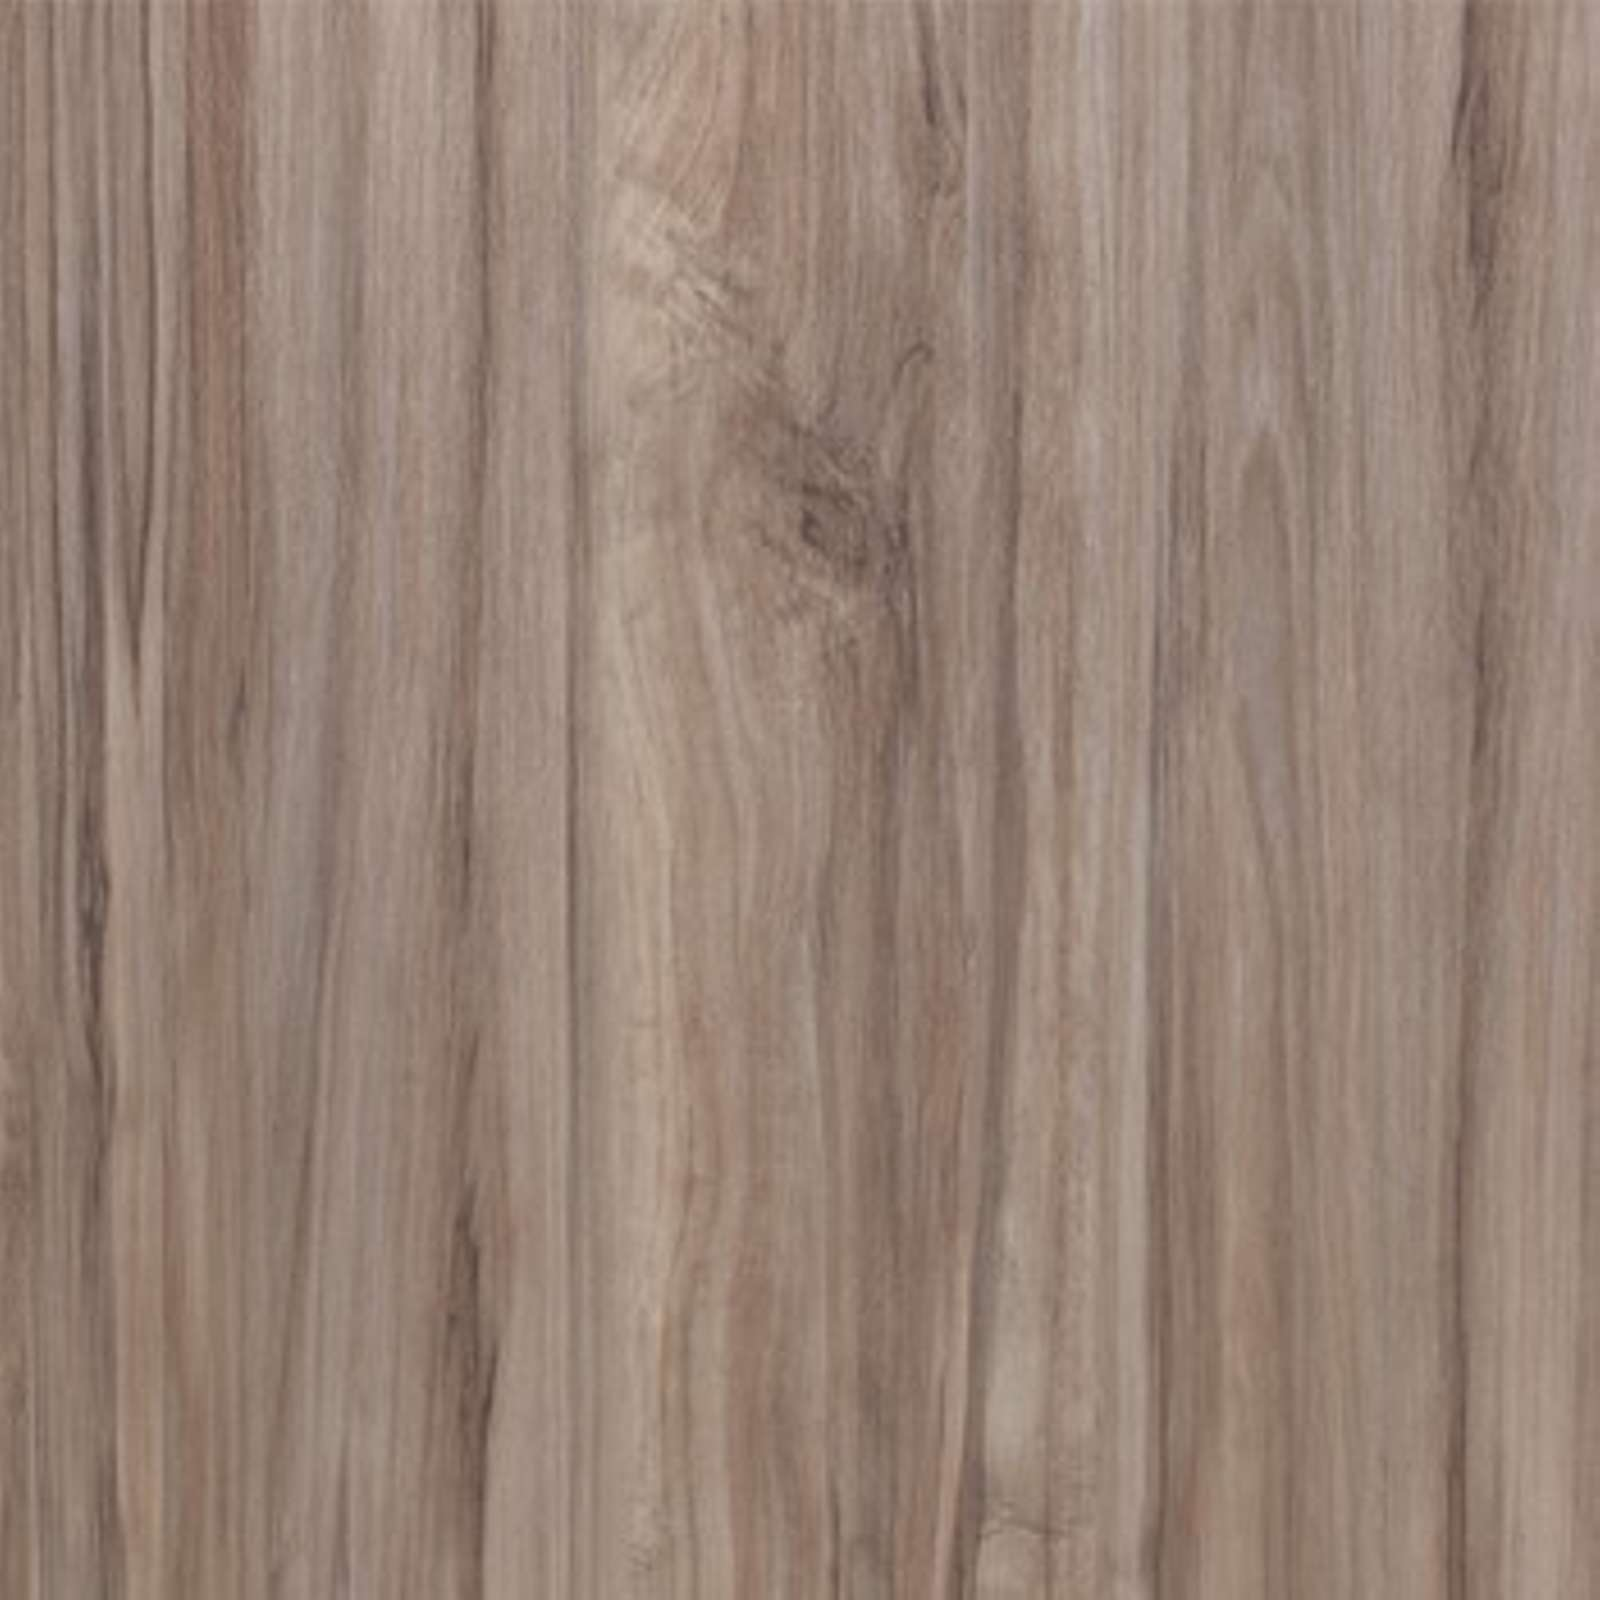 Плитка ПВХ Tarkett Art Vinil Lounge Acoustic 101,6х914,4x3мм(2,04м2/22шт/уп) 257010015